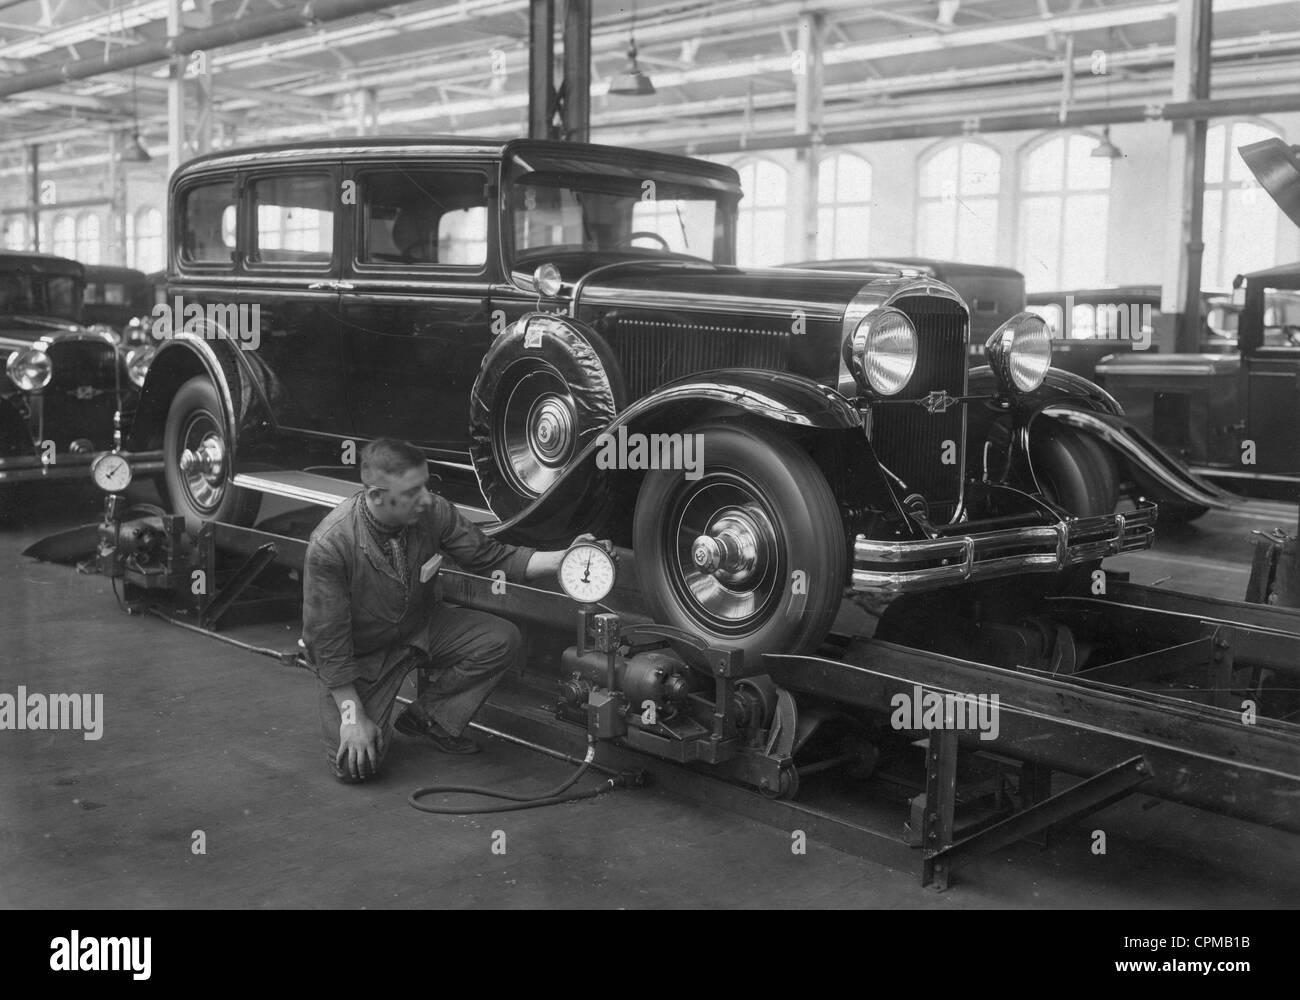 Car production at the General Motors in Berlin - Borsigwalde, 1929 - Stock Image